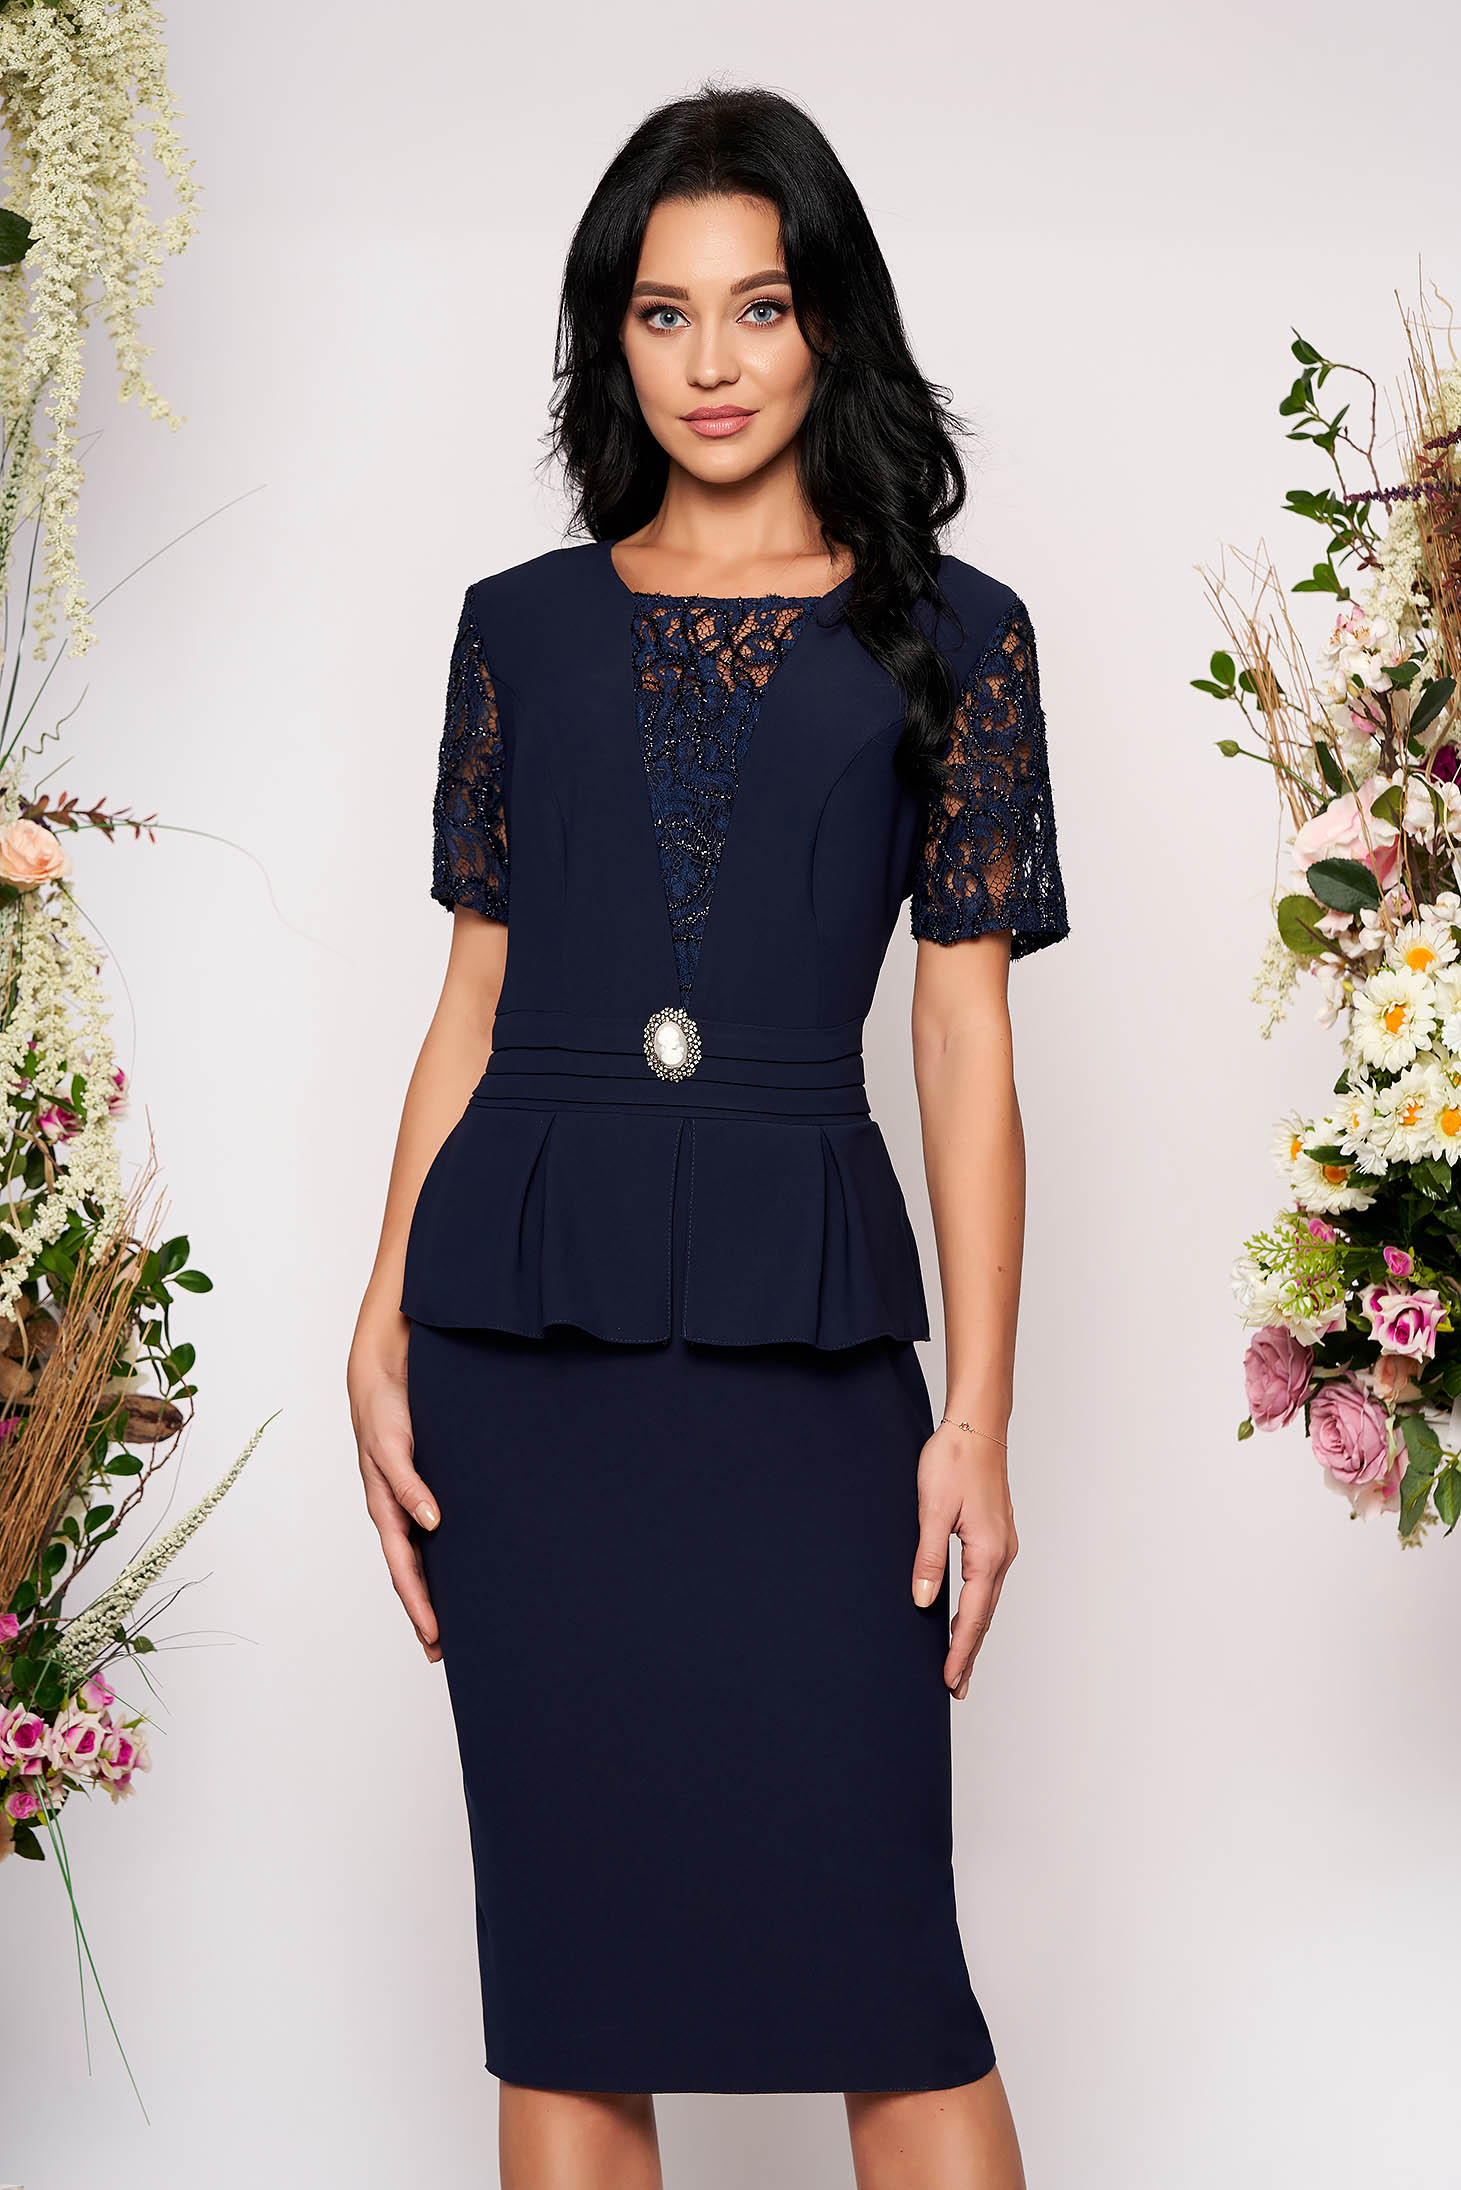 Rochie albastru-inchis midi de ocazie tip creion din stofa si dantela cu maneci scurte accesorizata cu brosa